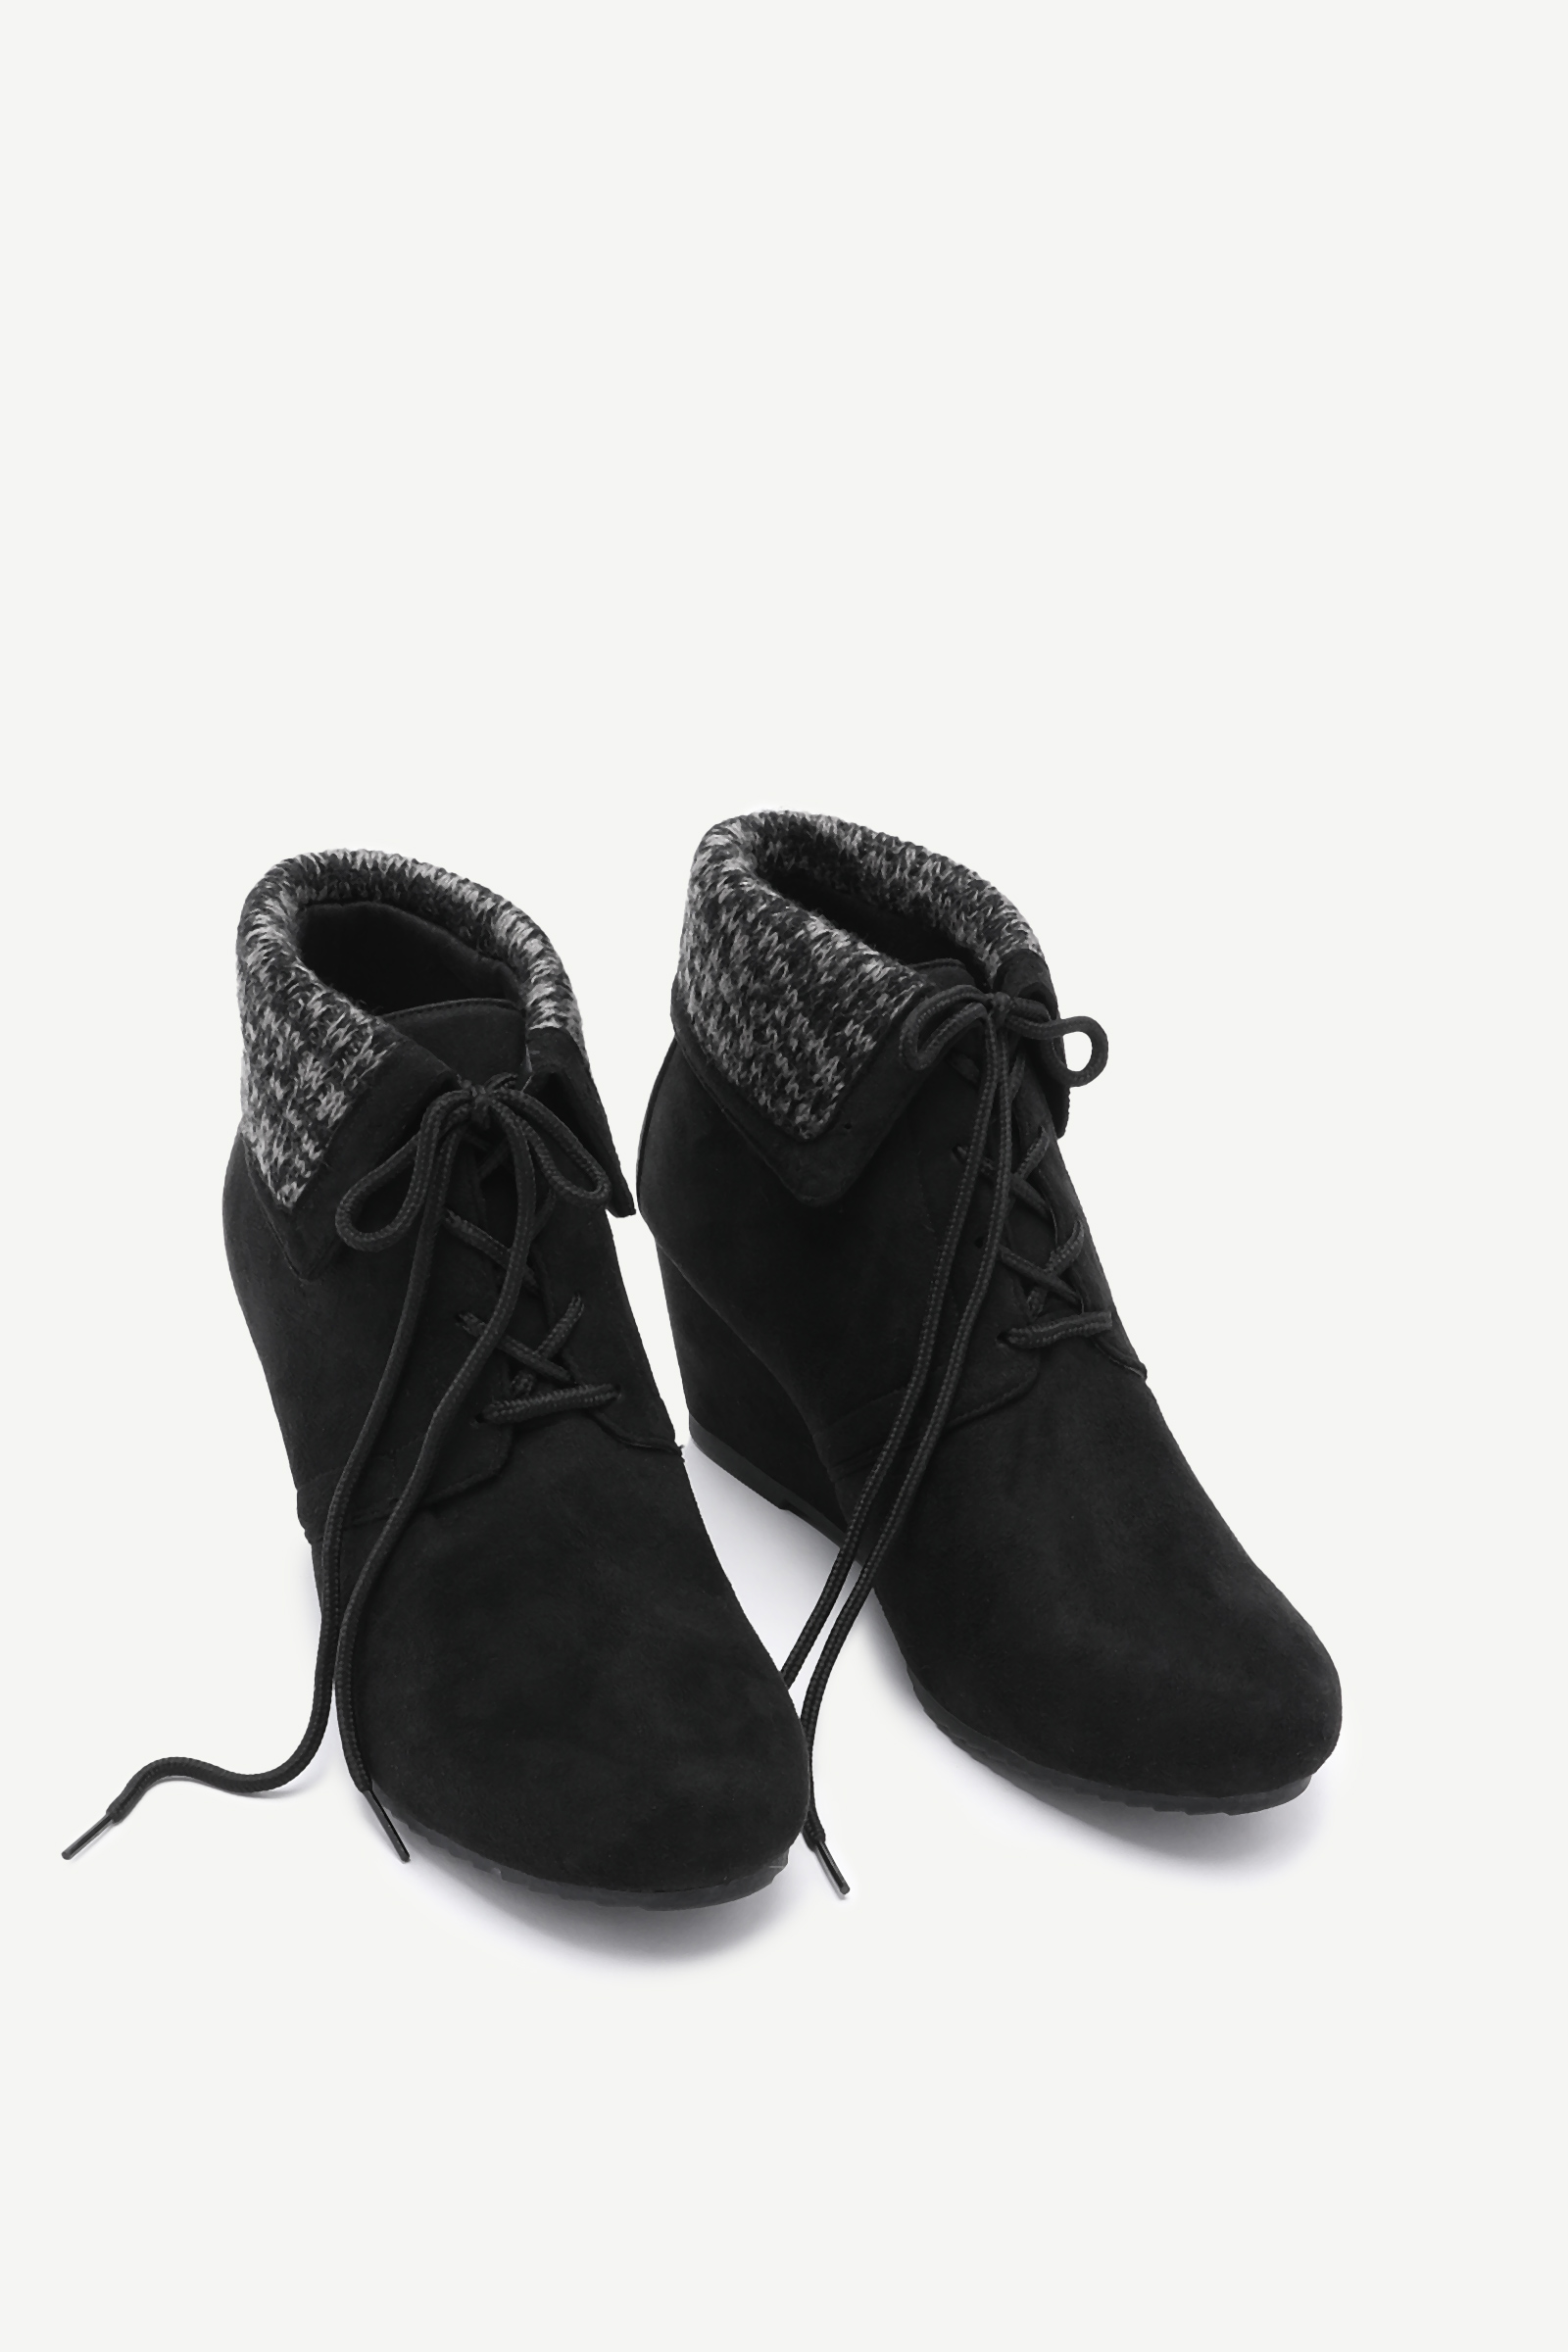 Folded Wedge Heel Booties